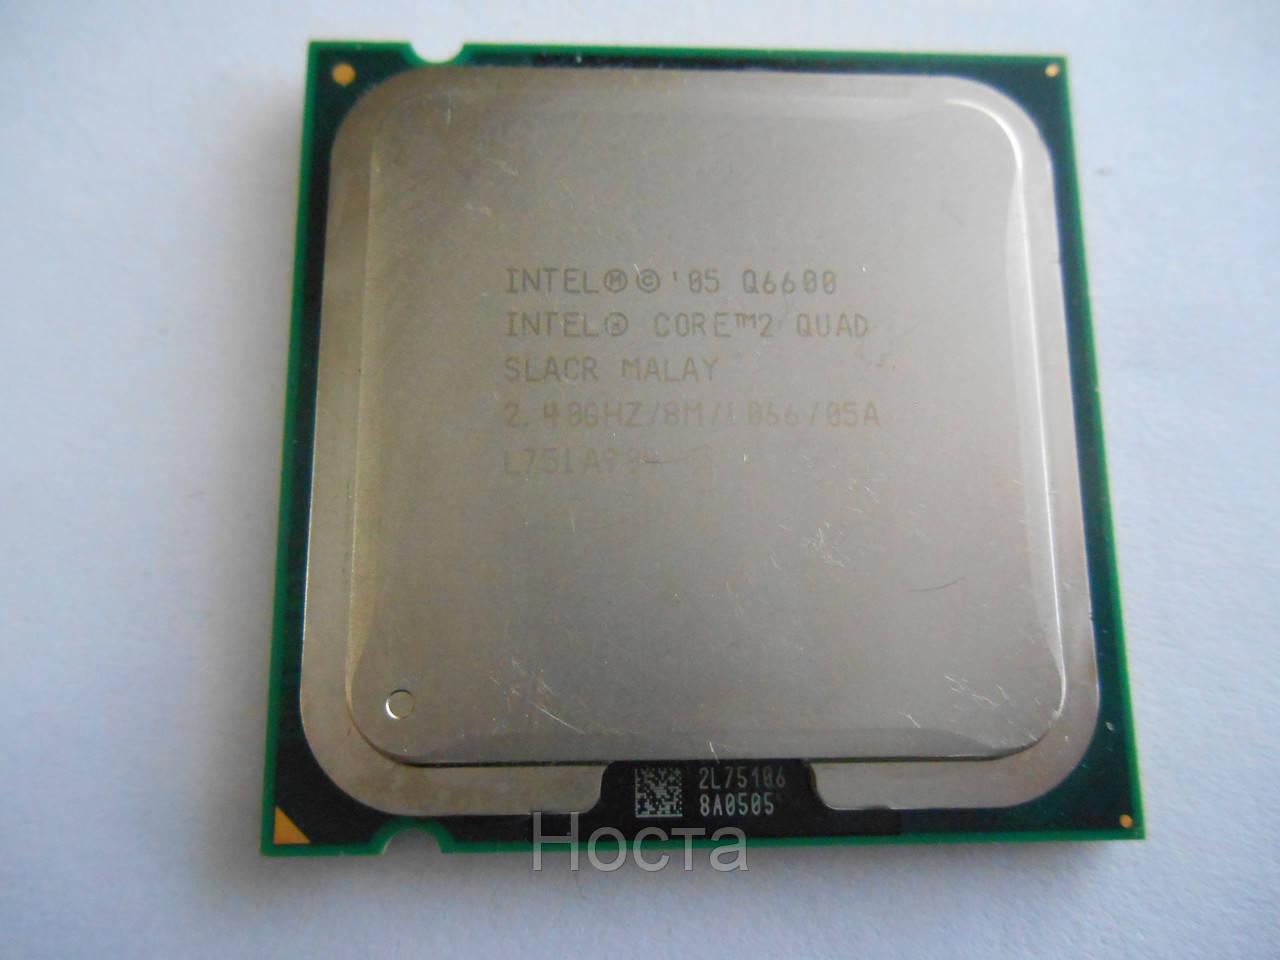 "Б/у Процессор Intel Core2 Quad Q6600 2.40GHz/8M/1066 s775, tray - Интернет-магазин ""Носта"" в Киеве"